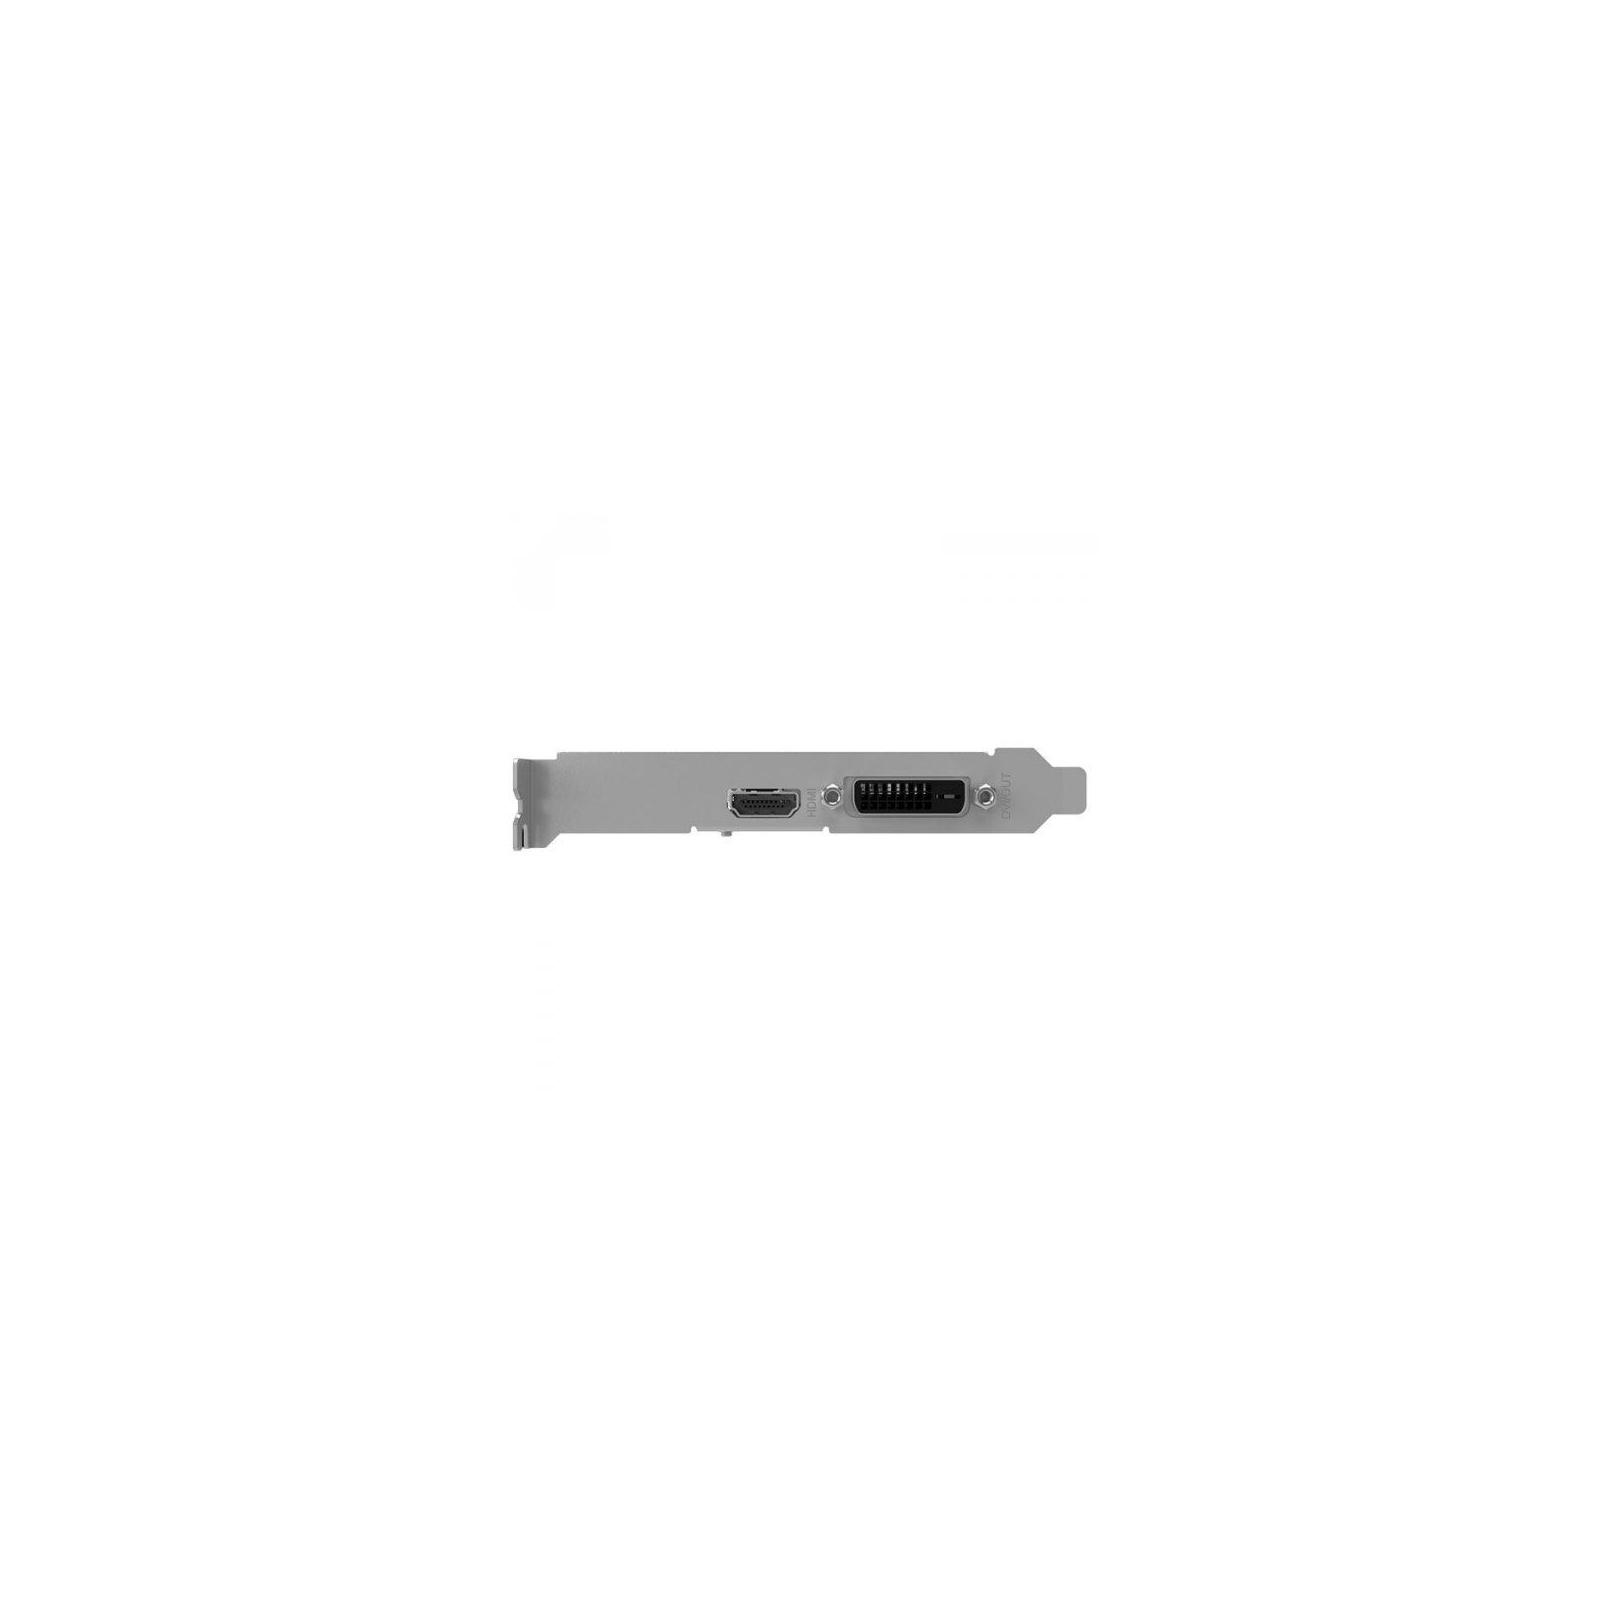 Видеокарта GeForce GT1030 2048Mb PALIT (NEC103000646-1082F) изображение 4